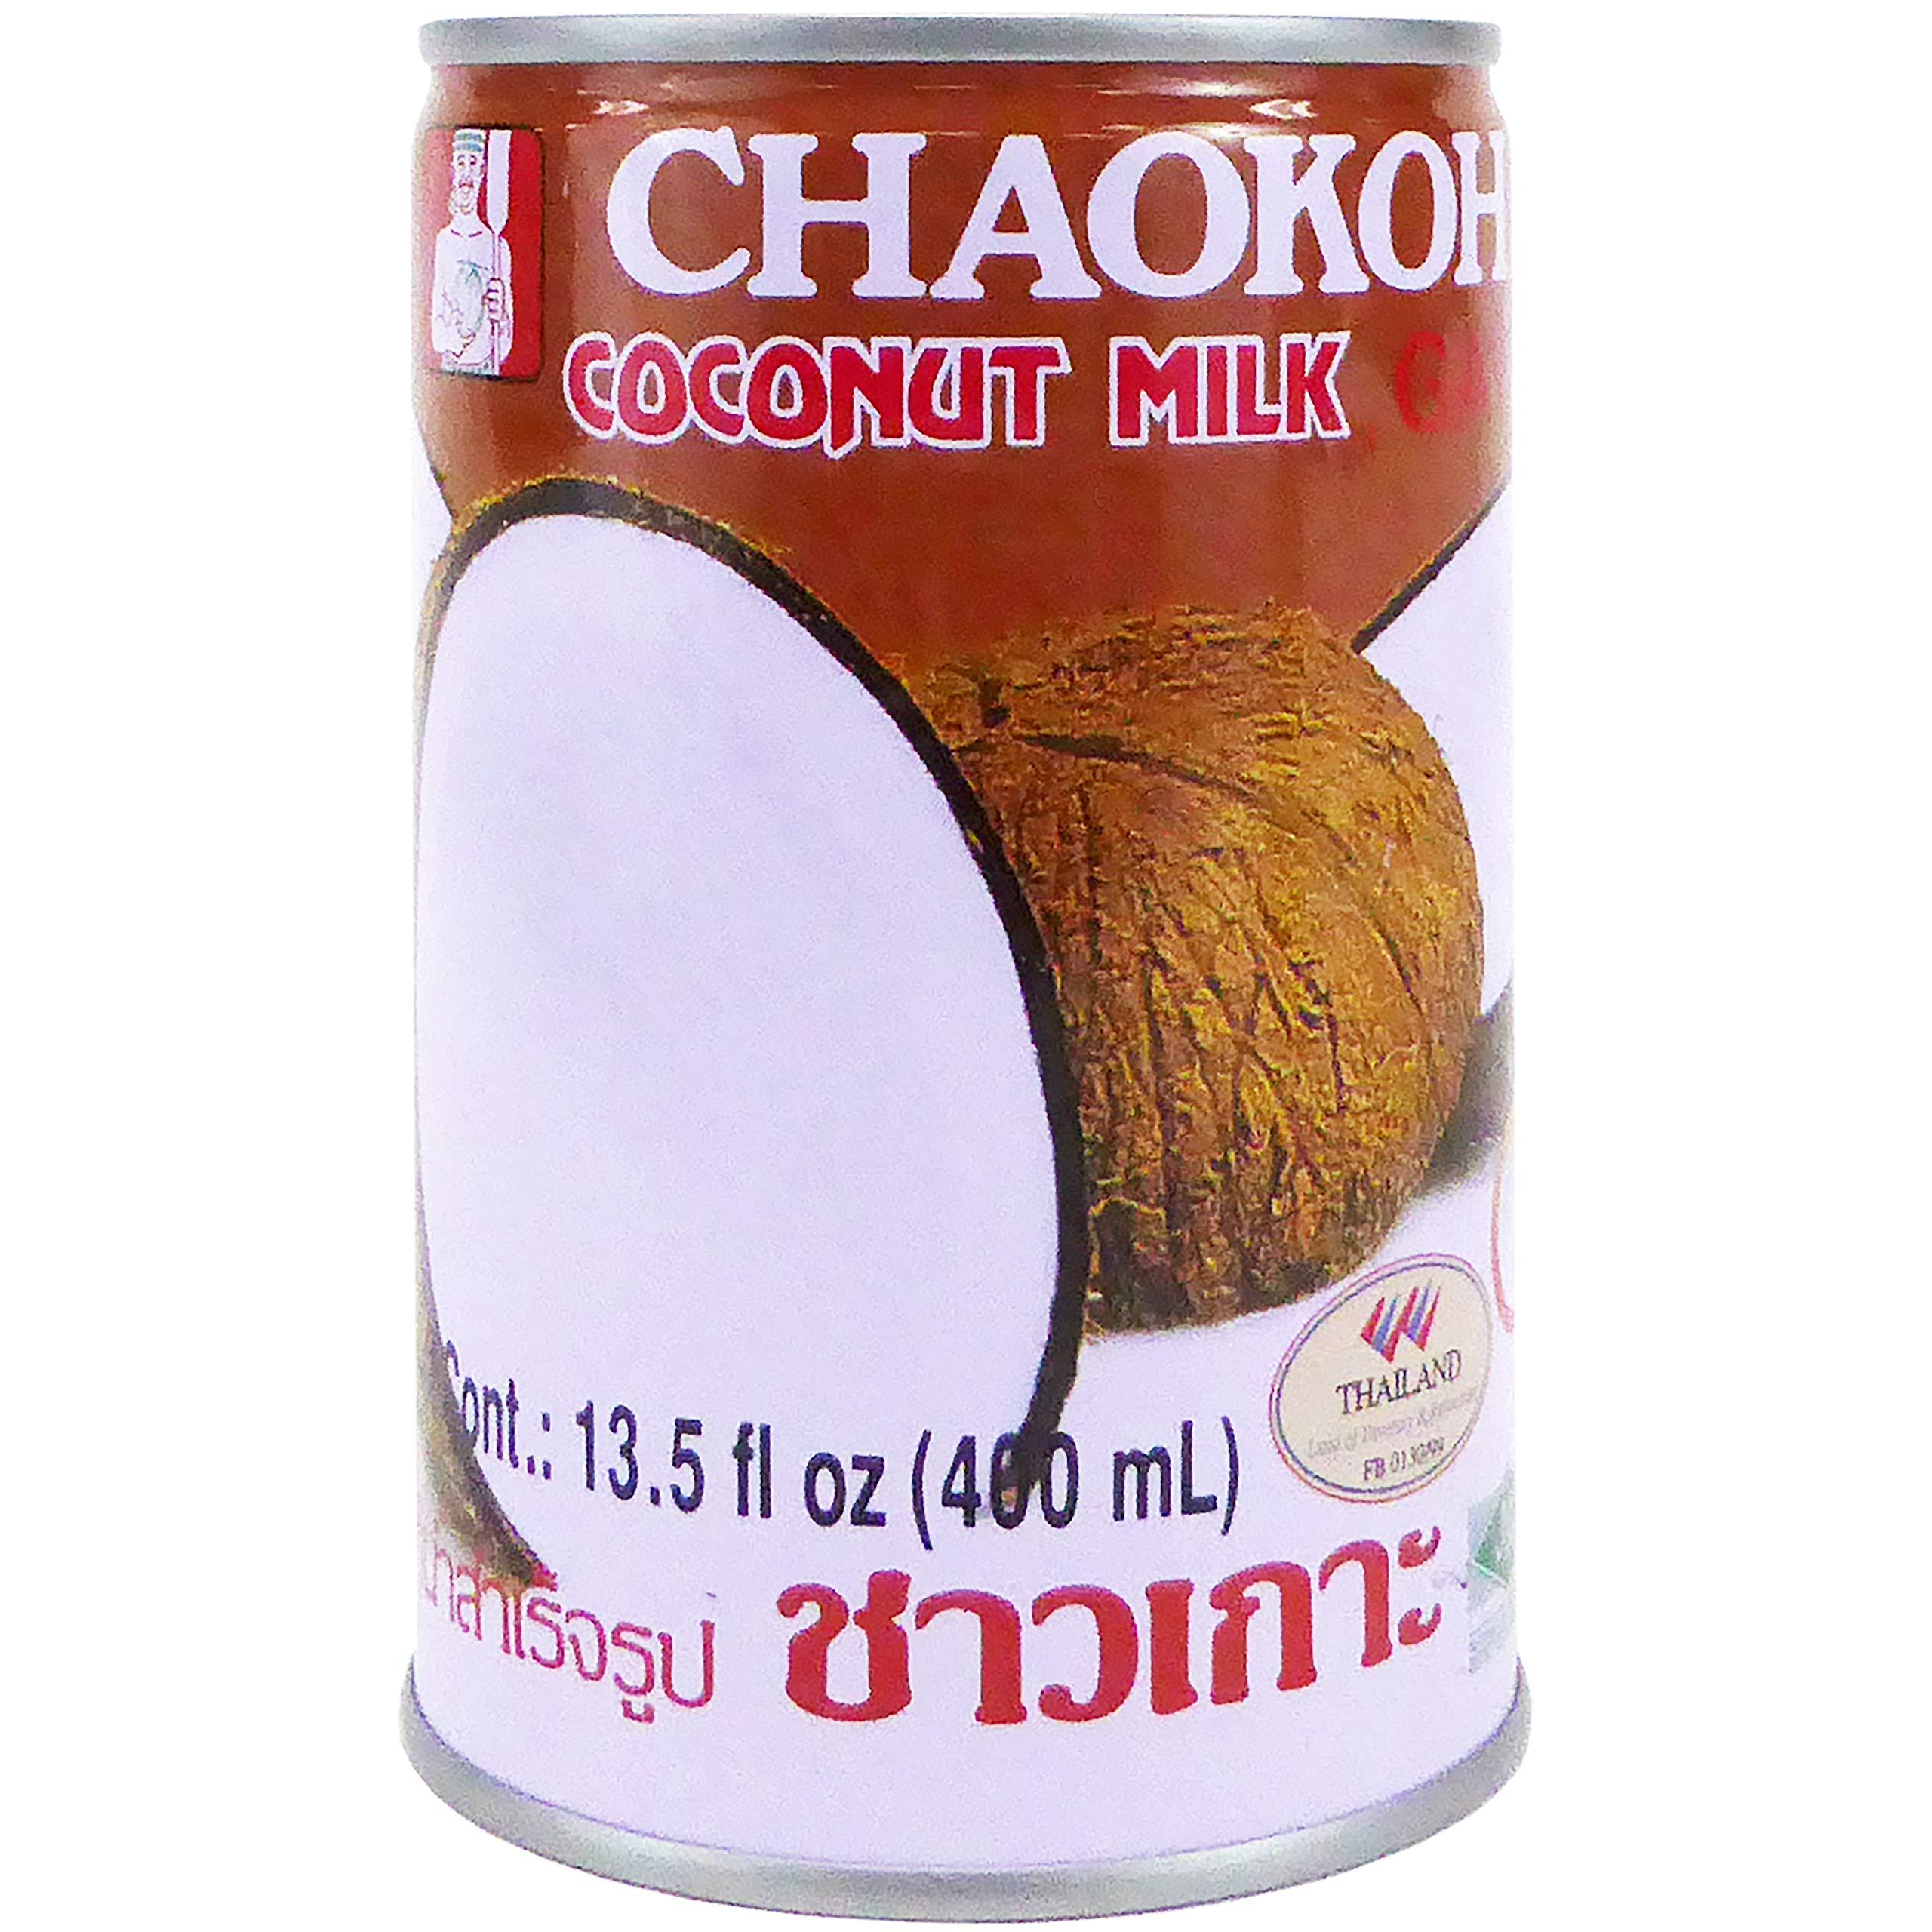 Chaokoh Coconut Milk 6 Pack- Creamy Coconut Milk, No Preservatives & Artificial Flavors, No Added Sugar, (13.5 oz per can)